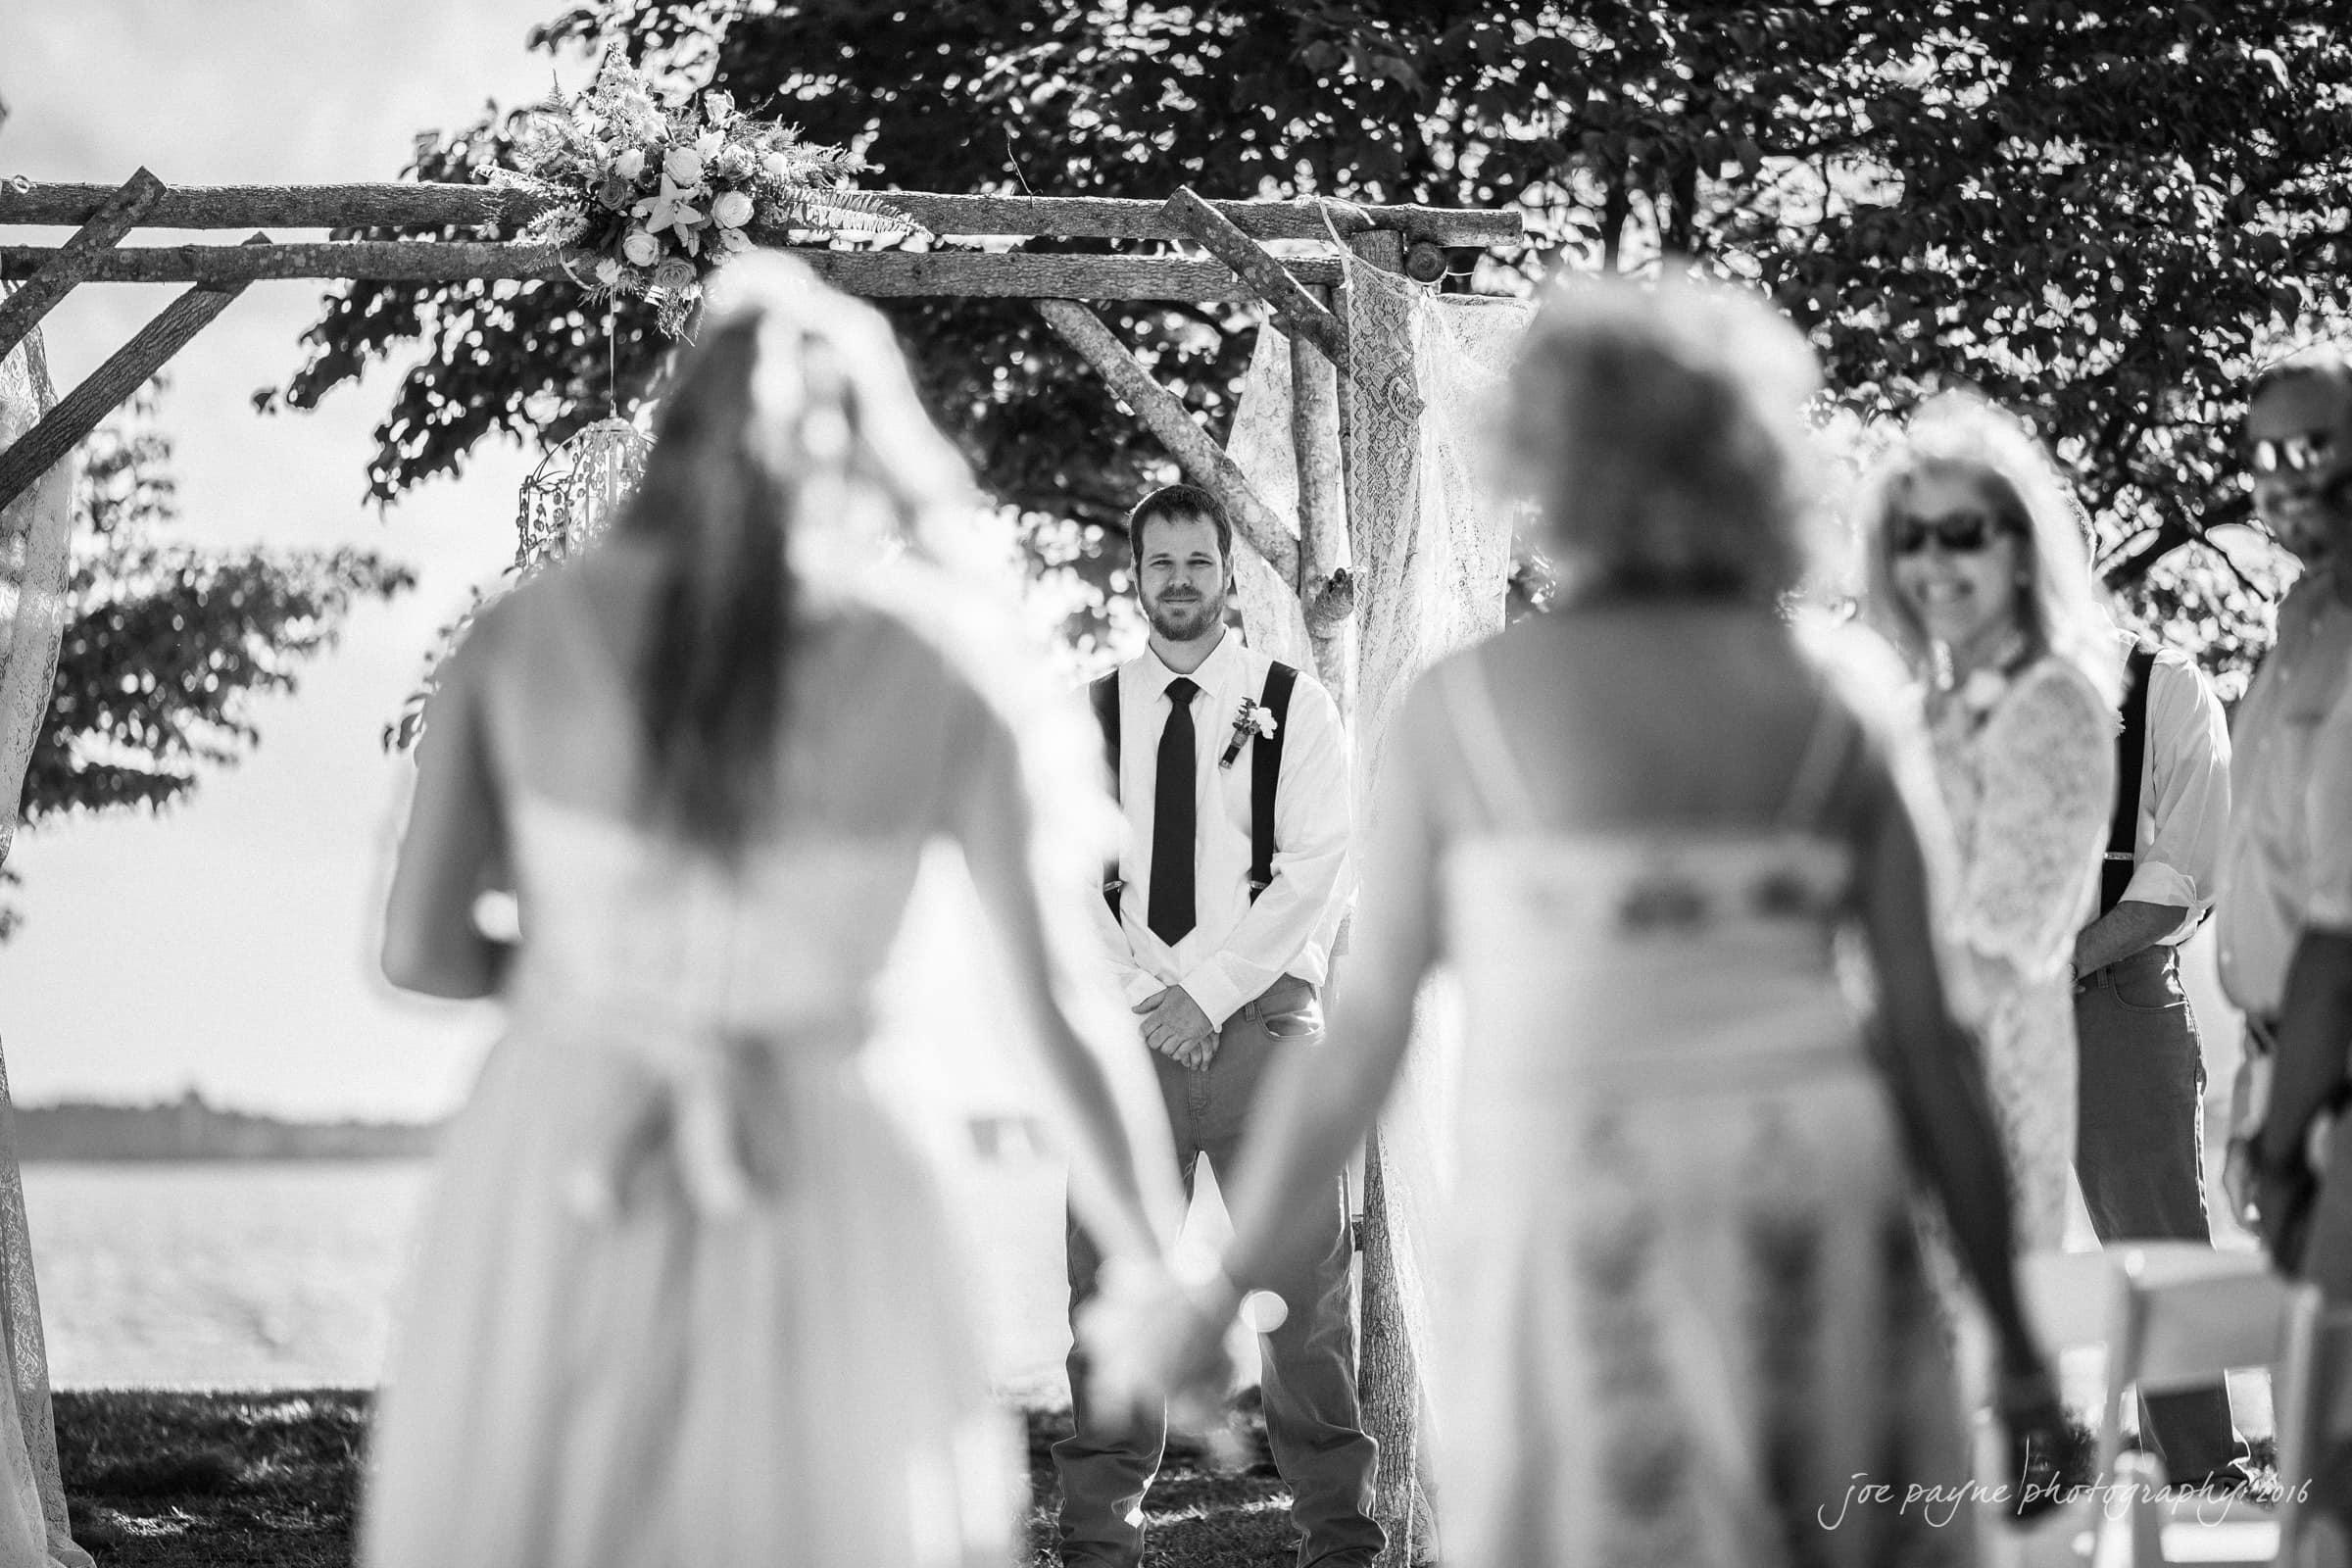 New Bern Wedding Photography - Jessica & Brinson-25